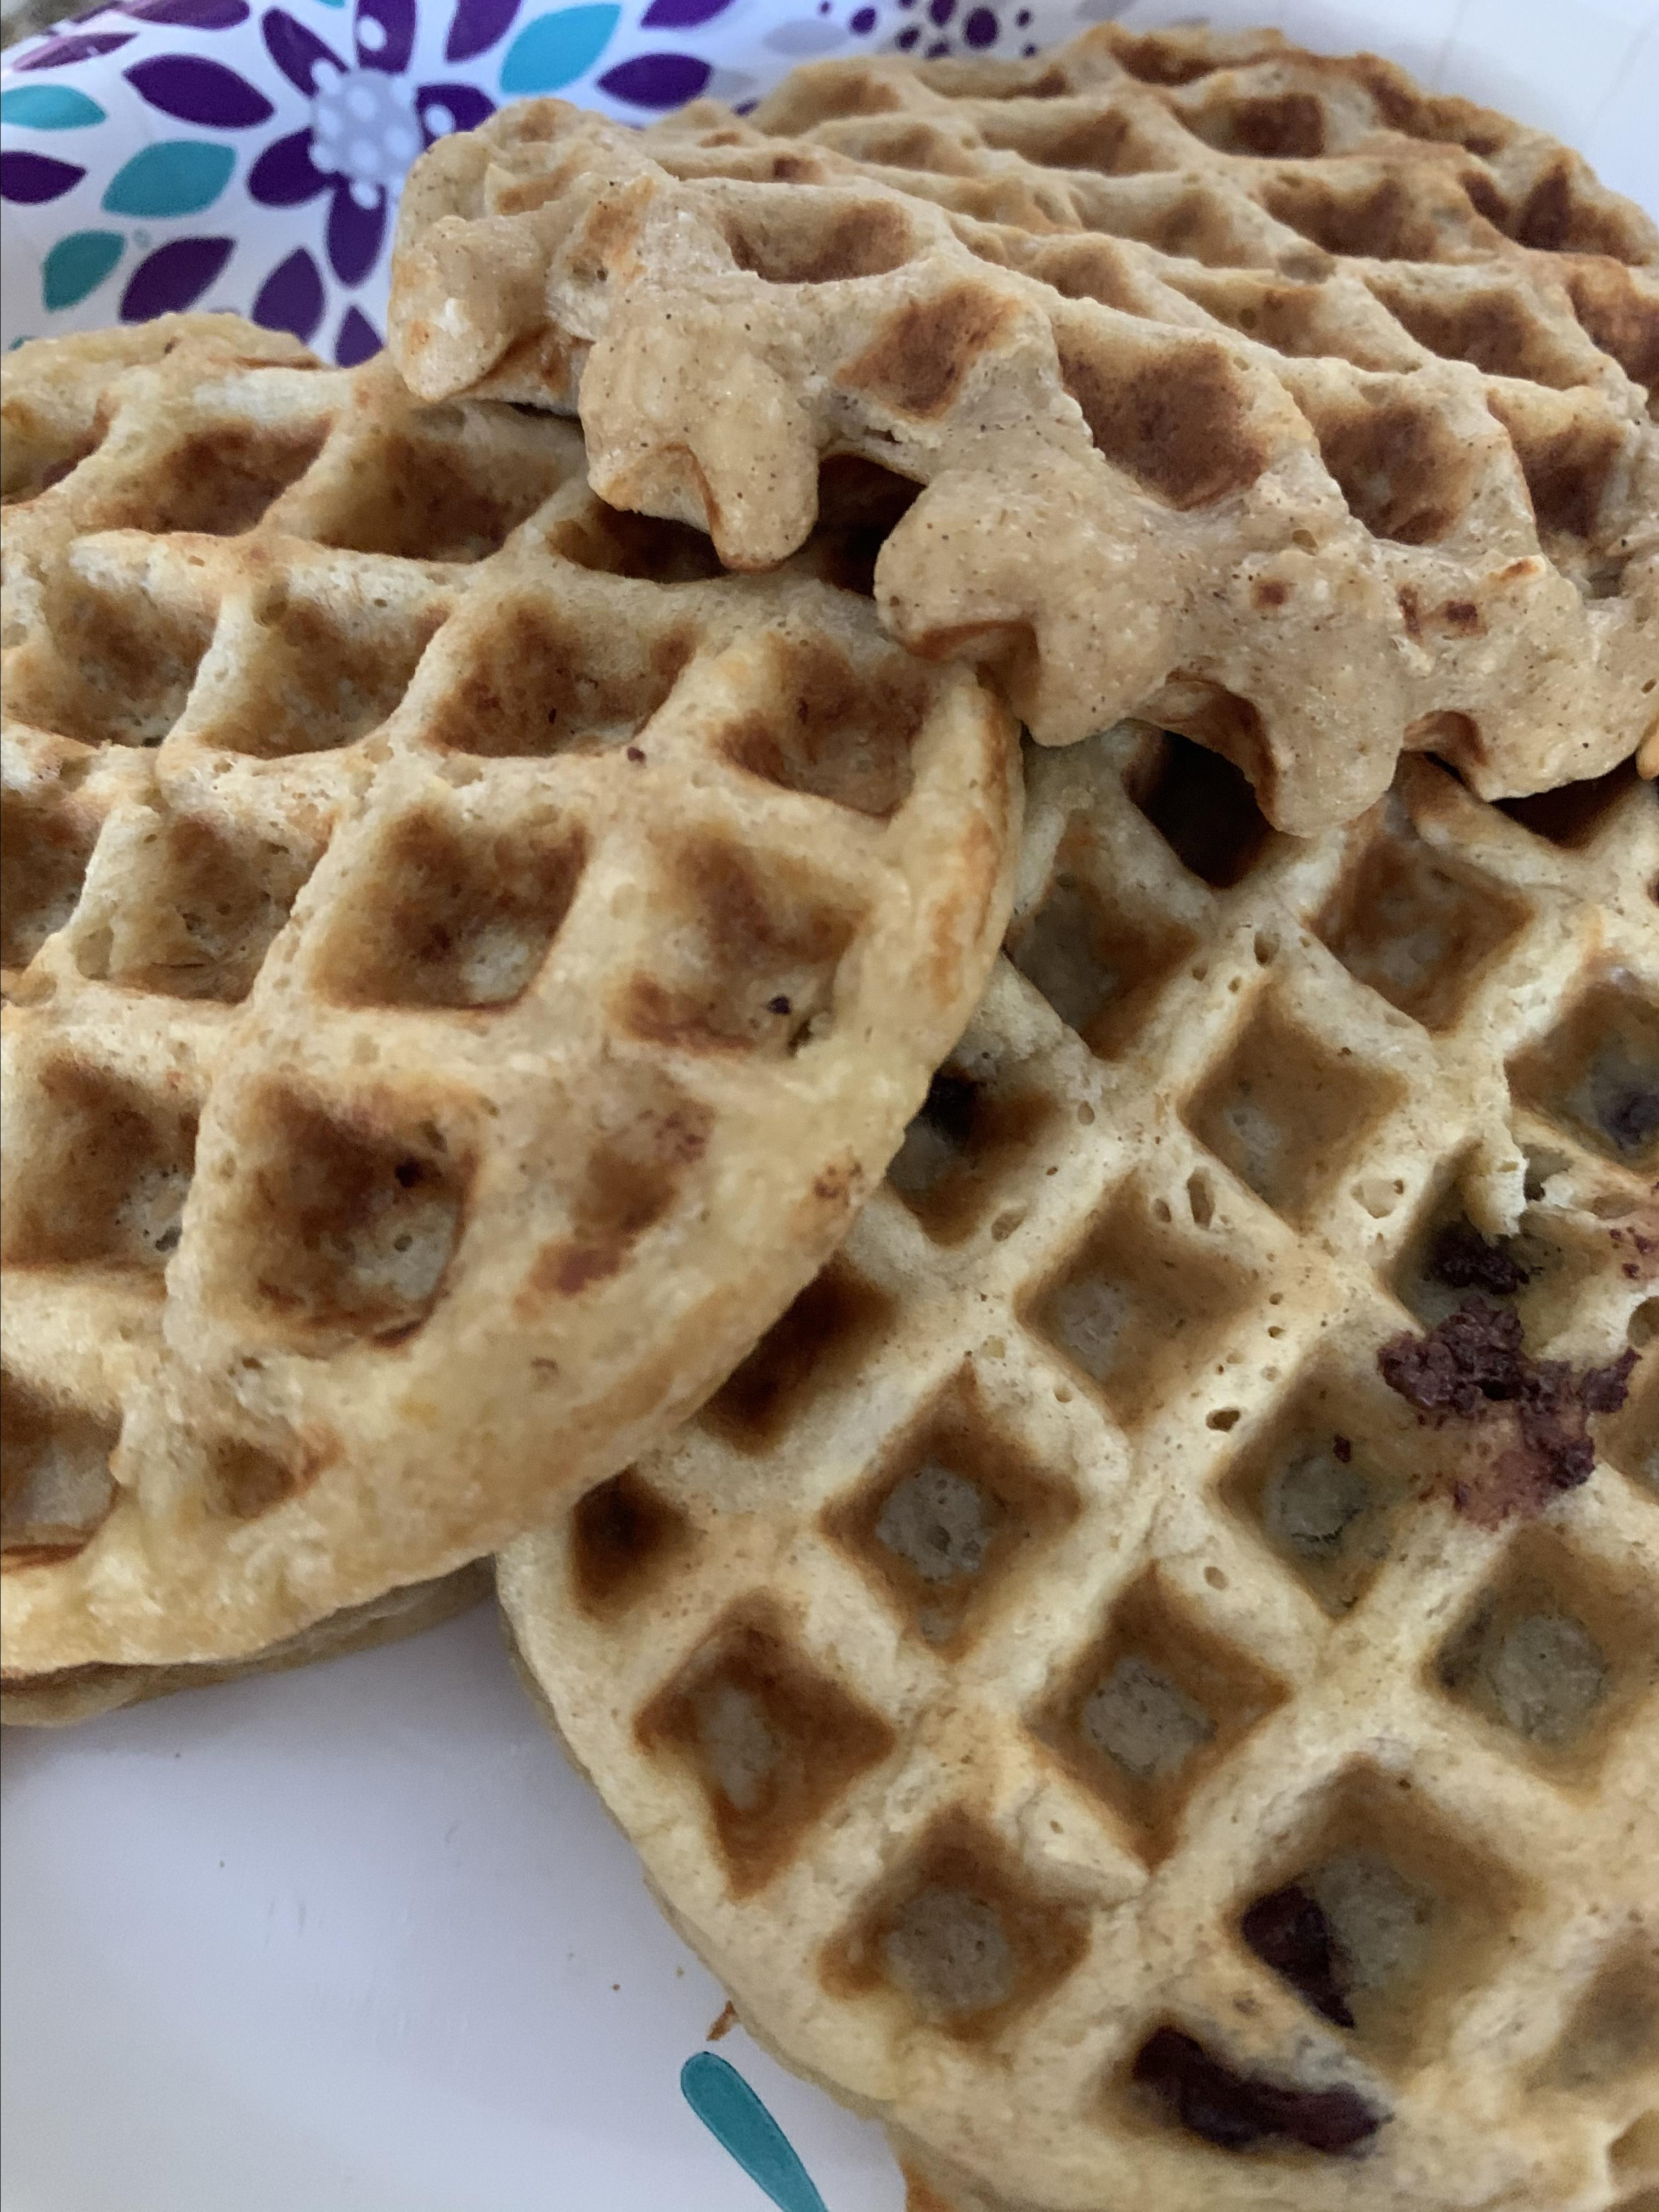 Cathy's Gluten-Free Oatmeal Waffles